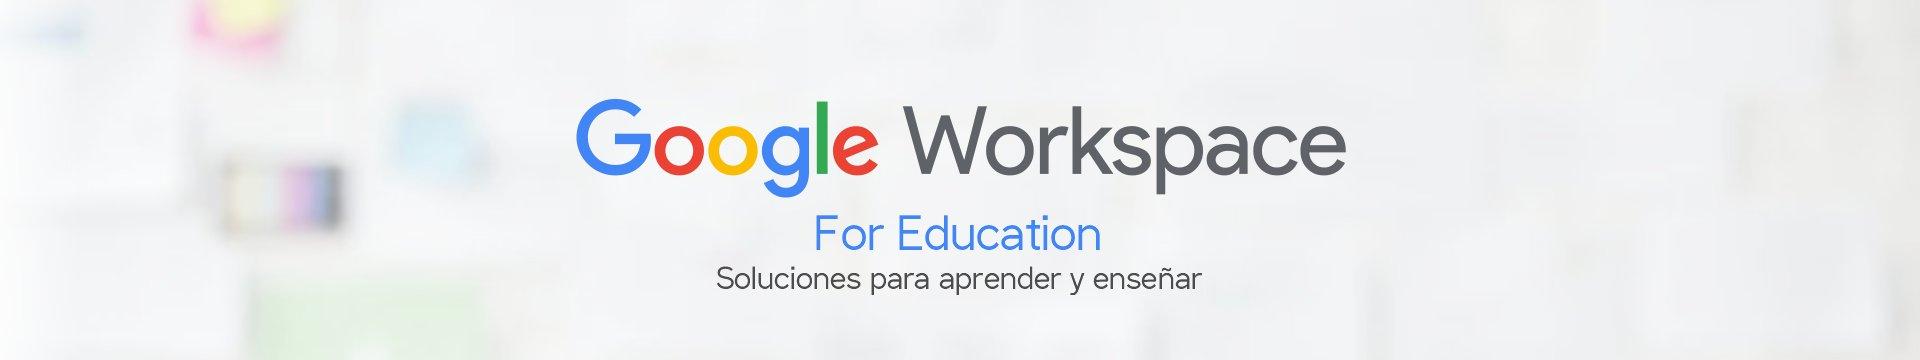 Google Workspace for Education Perú